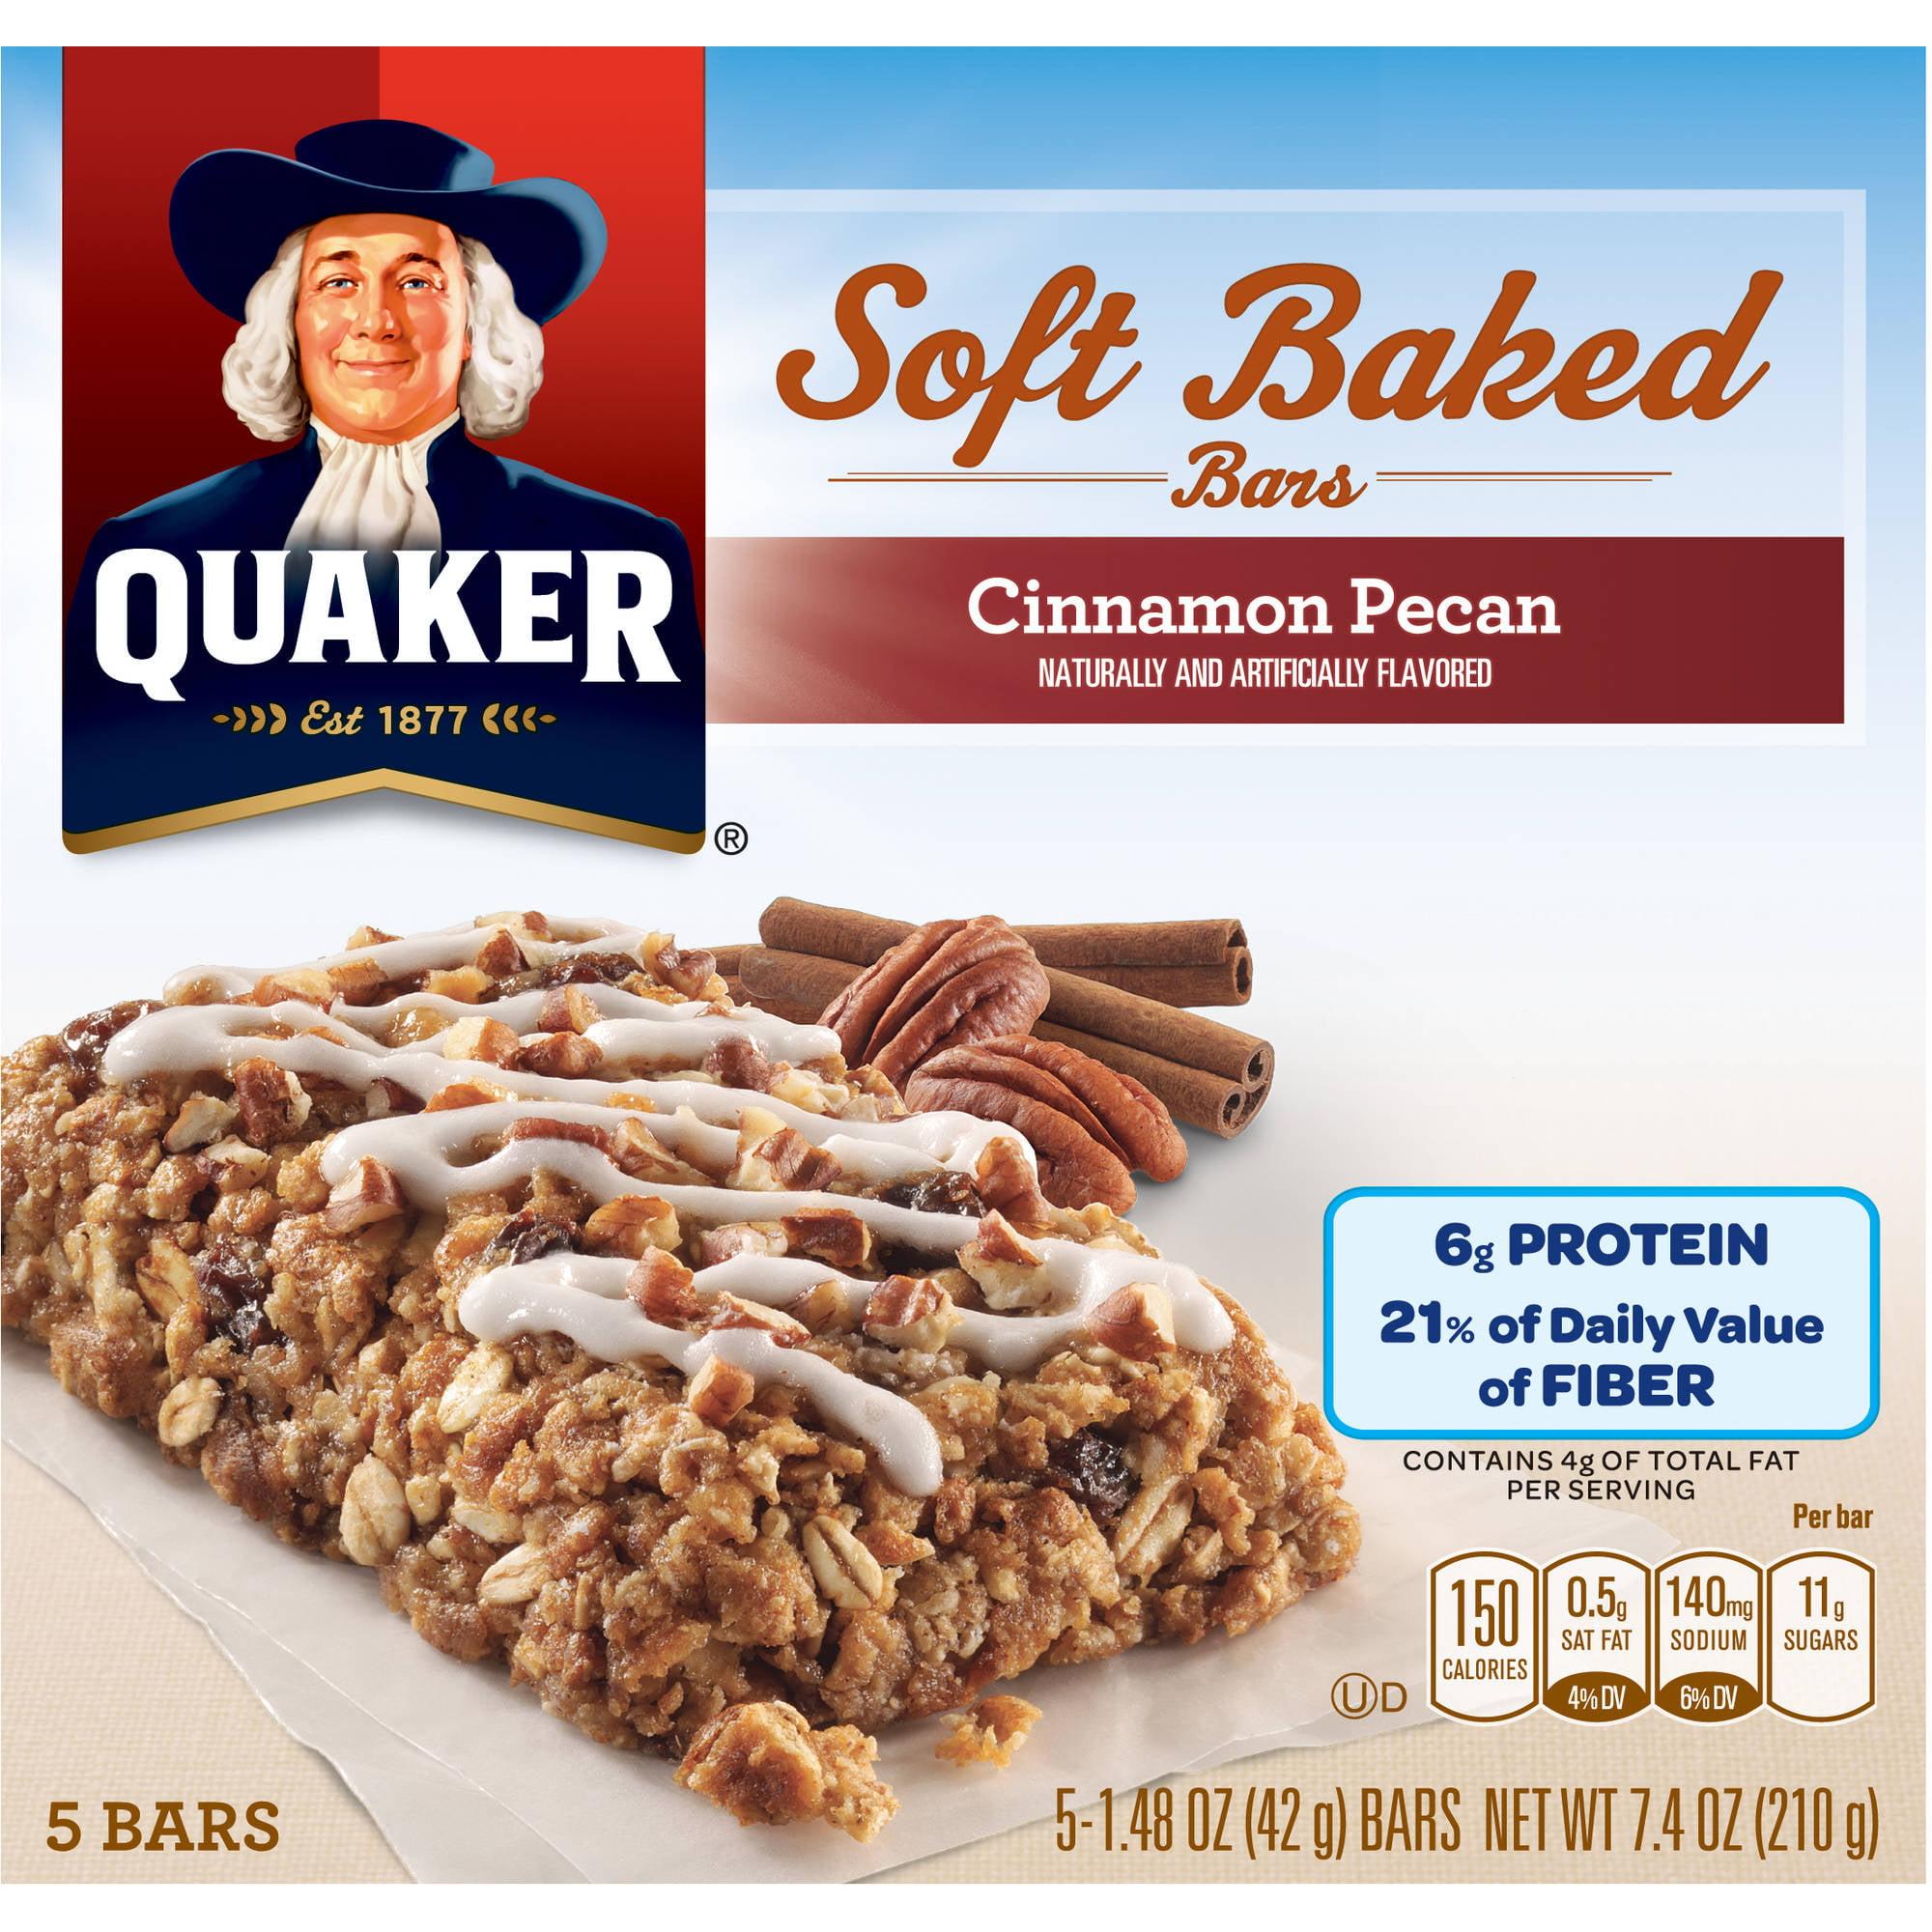 Quaker Cinnamon Pecan Bread Soft Baked Bars, 1.48 oz, 5 count